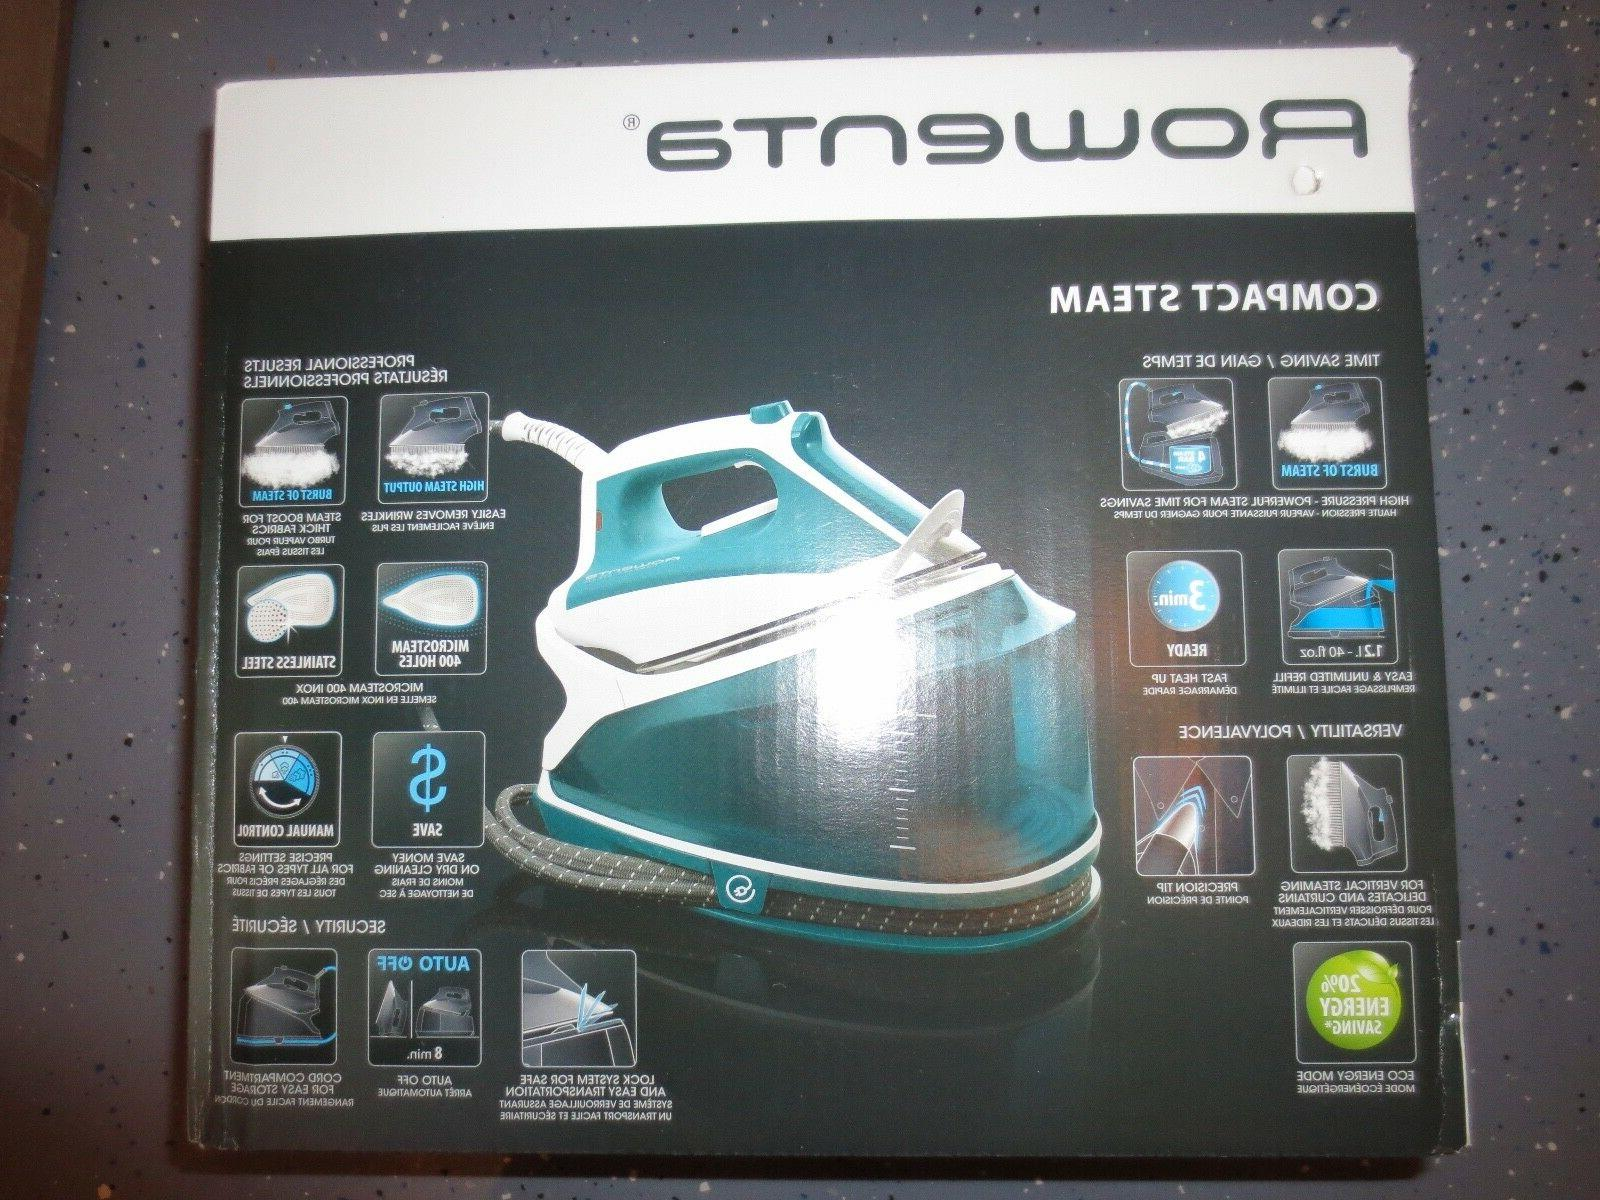 Rowenta DG7530 1800-Watt